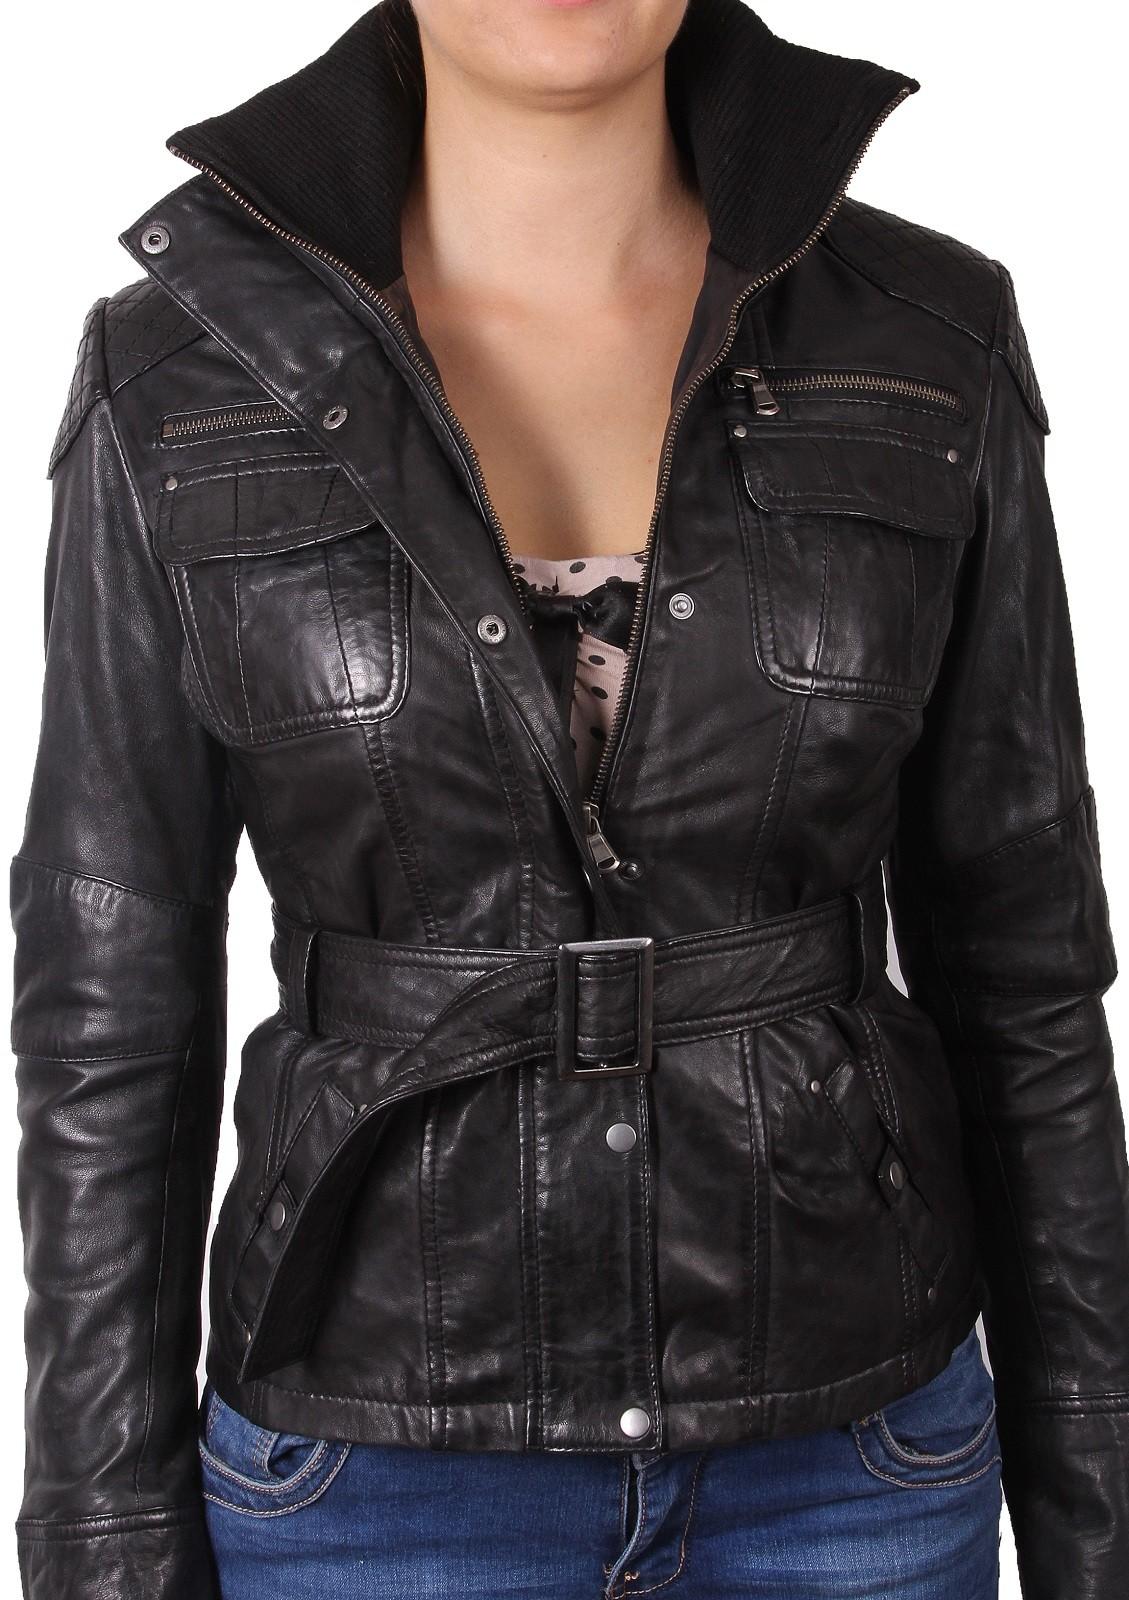 2a0796fc644f Women-bomber-jacket-black-isabel.jpg